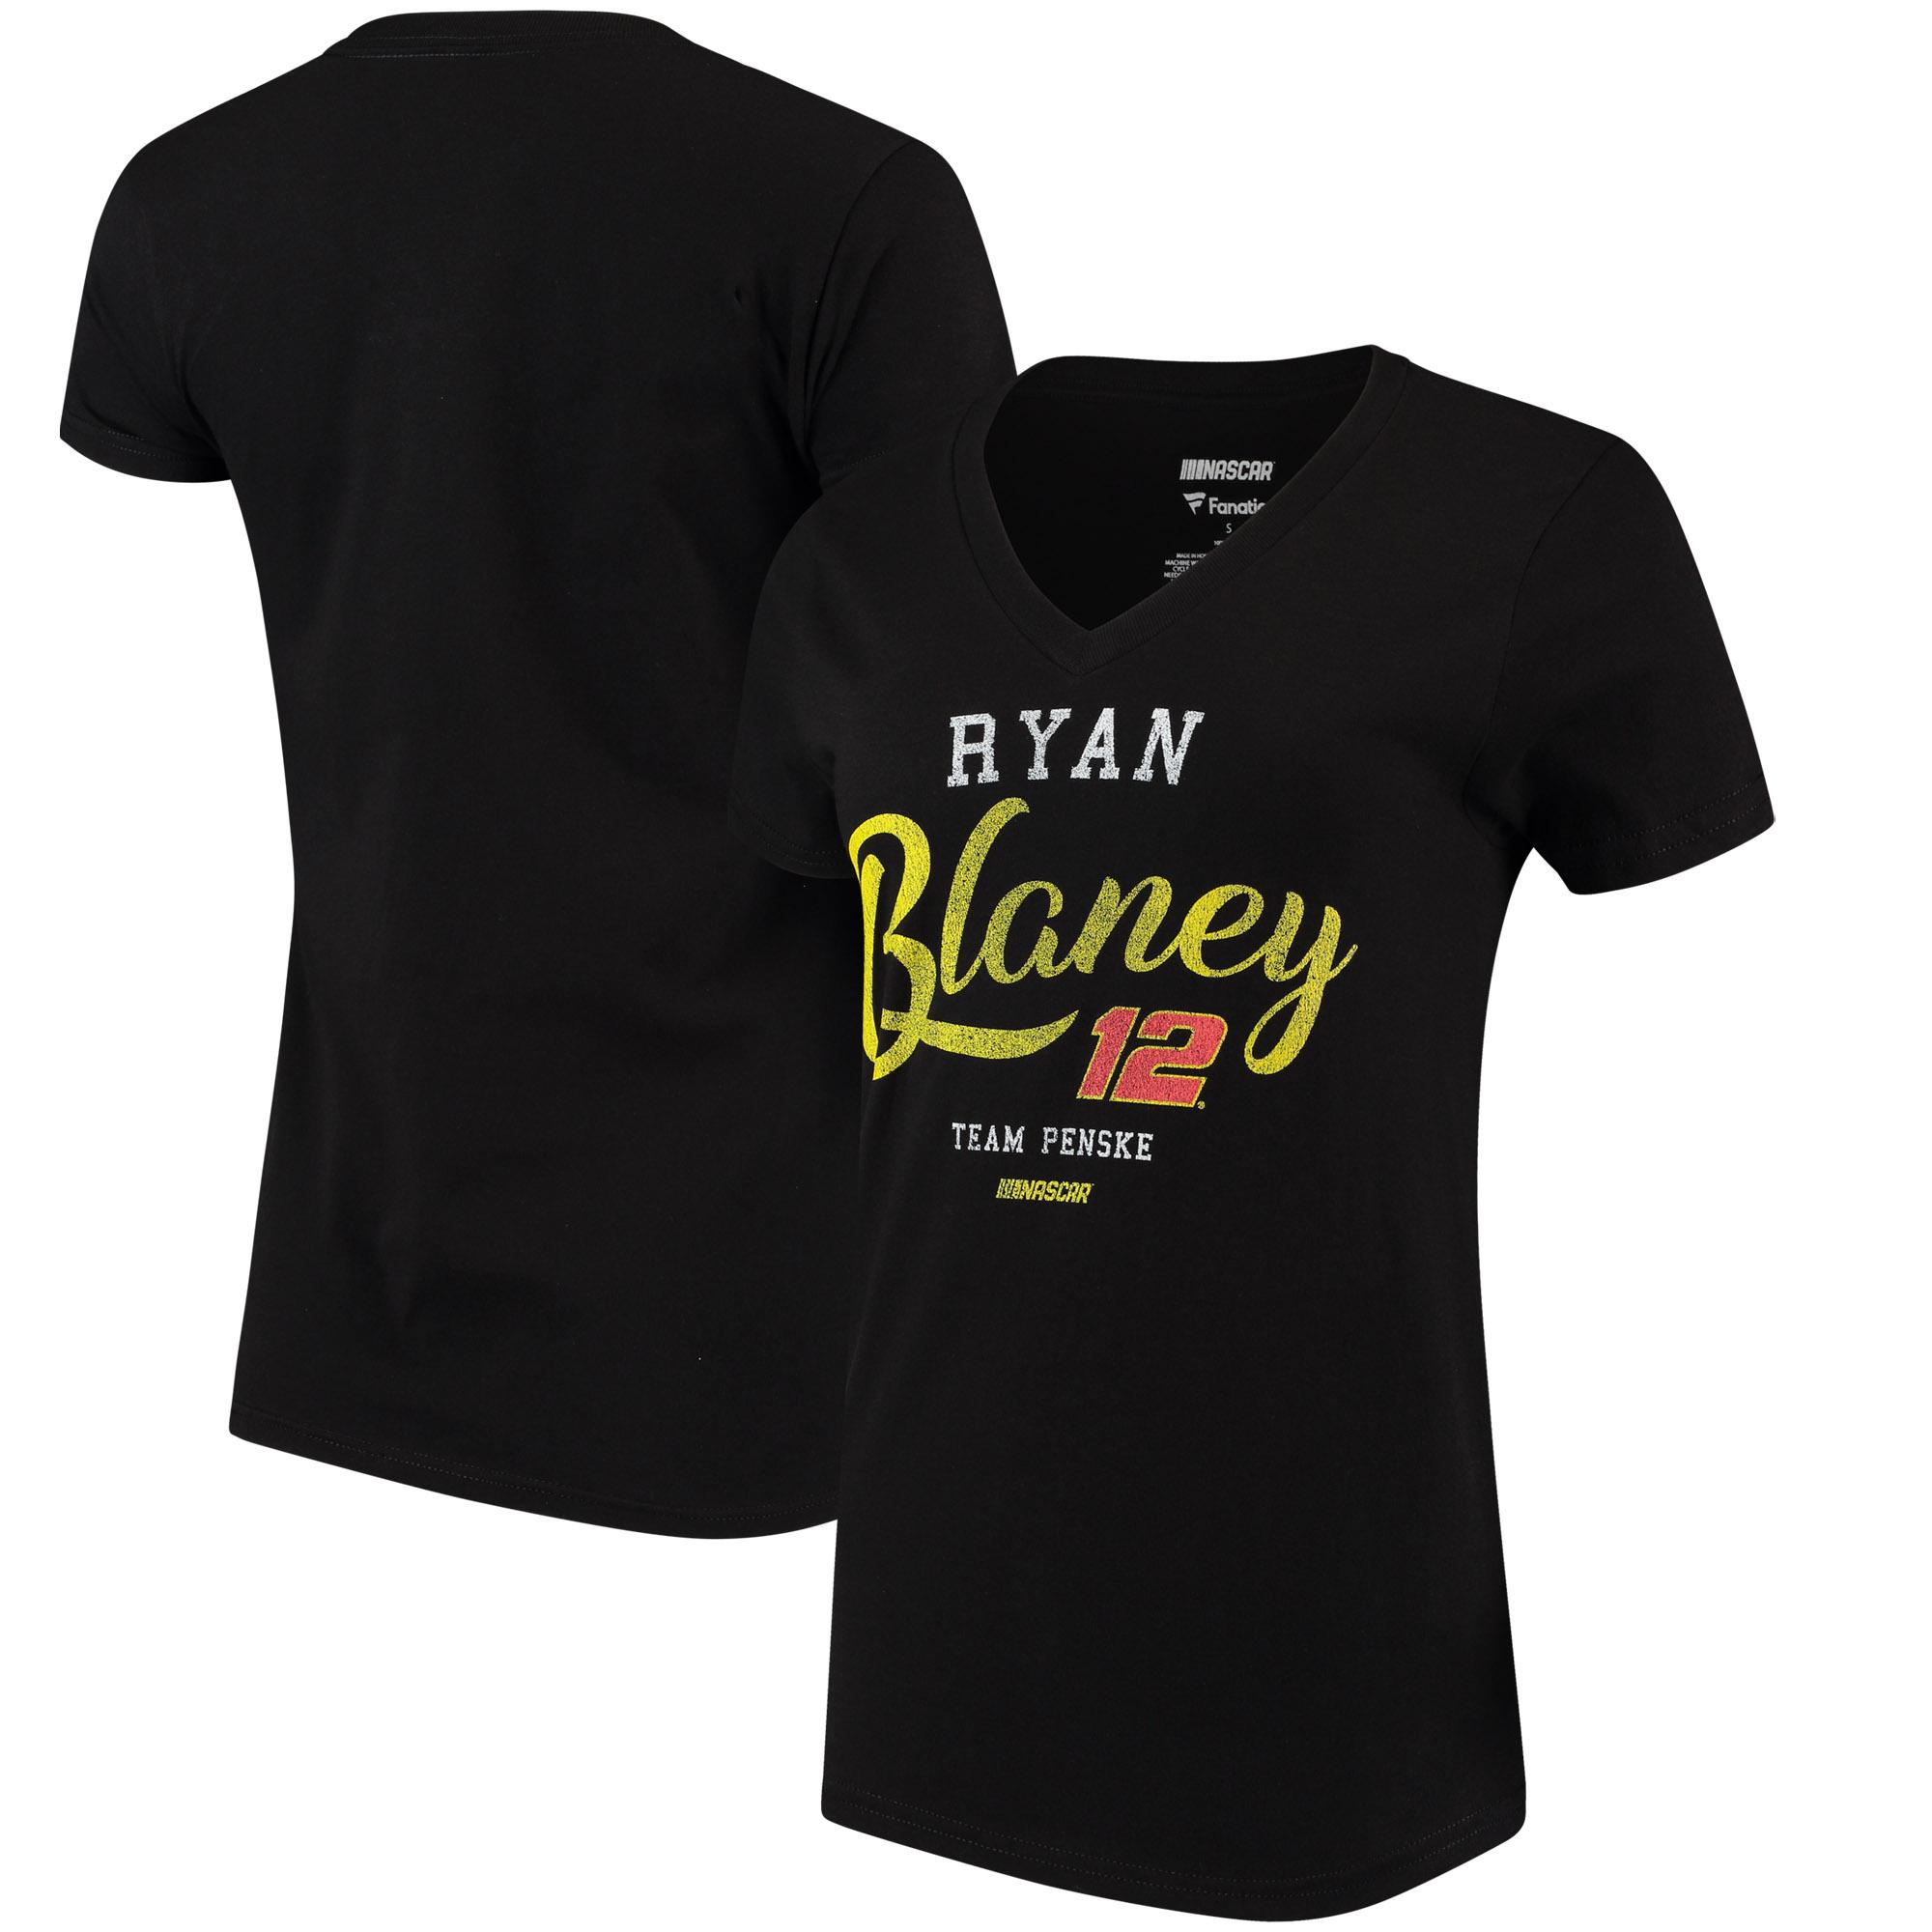 Ryan Blaney Fanatics Branded Women's Driver Team V-Neck T-Shirt - Red